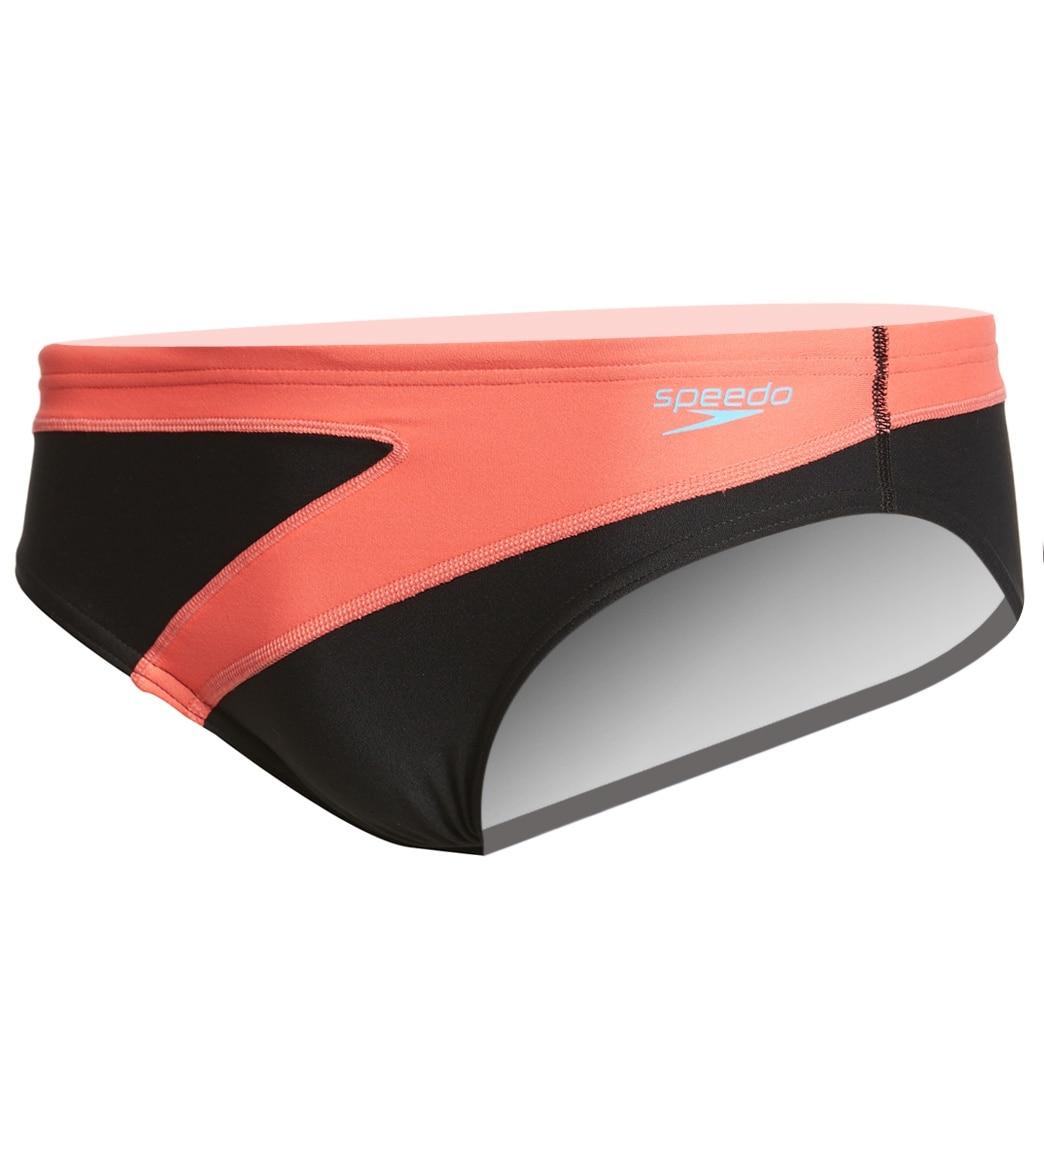 a9db1ee4b6ae0 Speedo Men's Turnz Colorblock Brief Swimsuit at SwimOutlet.com